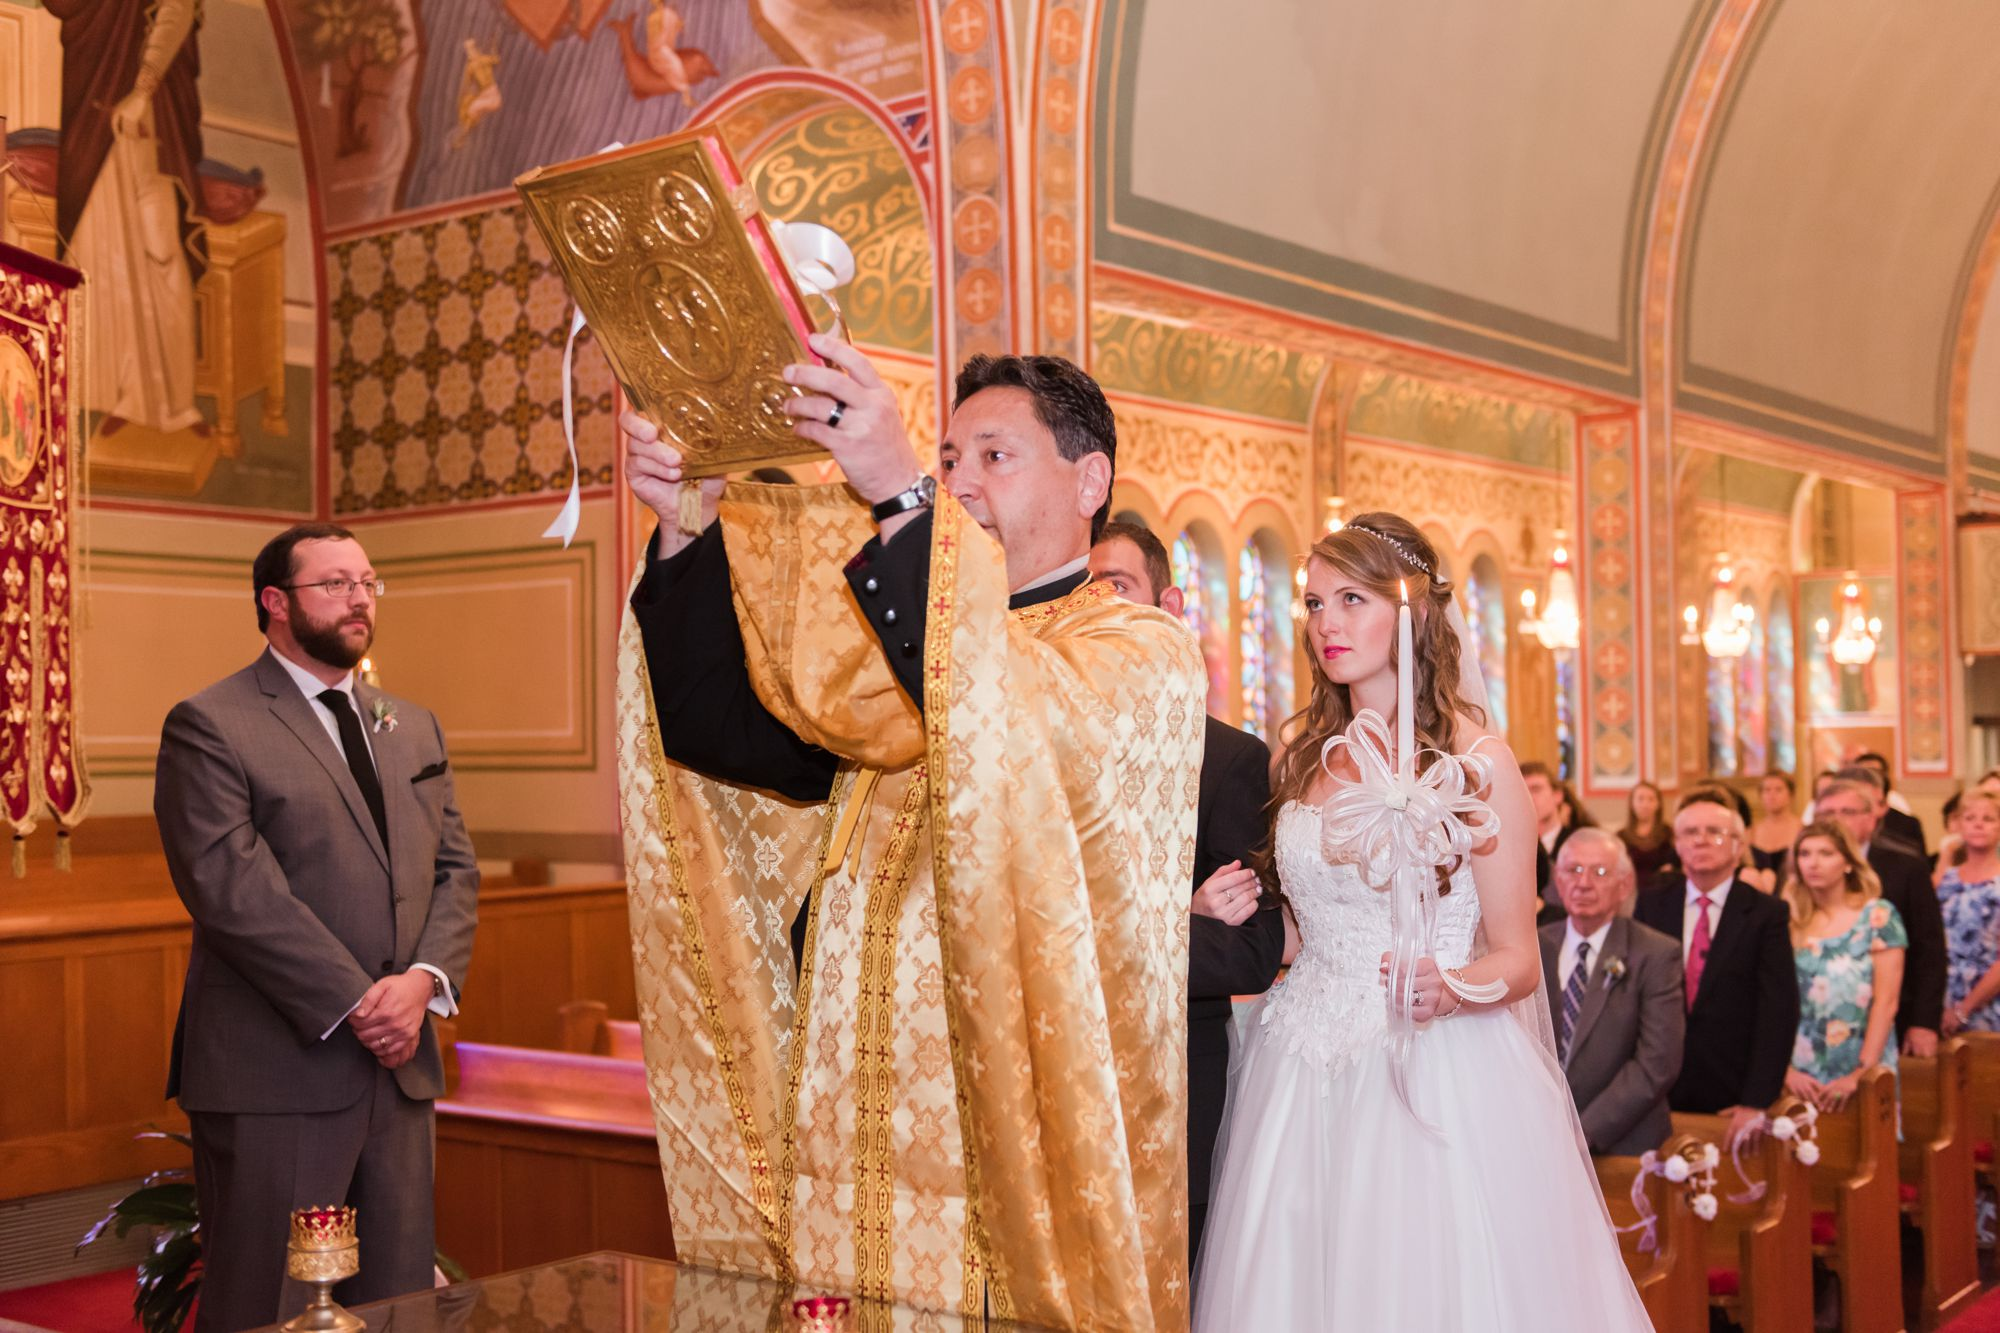 uptown-charlotte-orthodox-greek-wedding 62